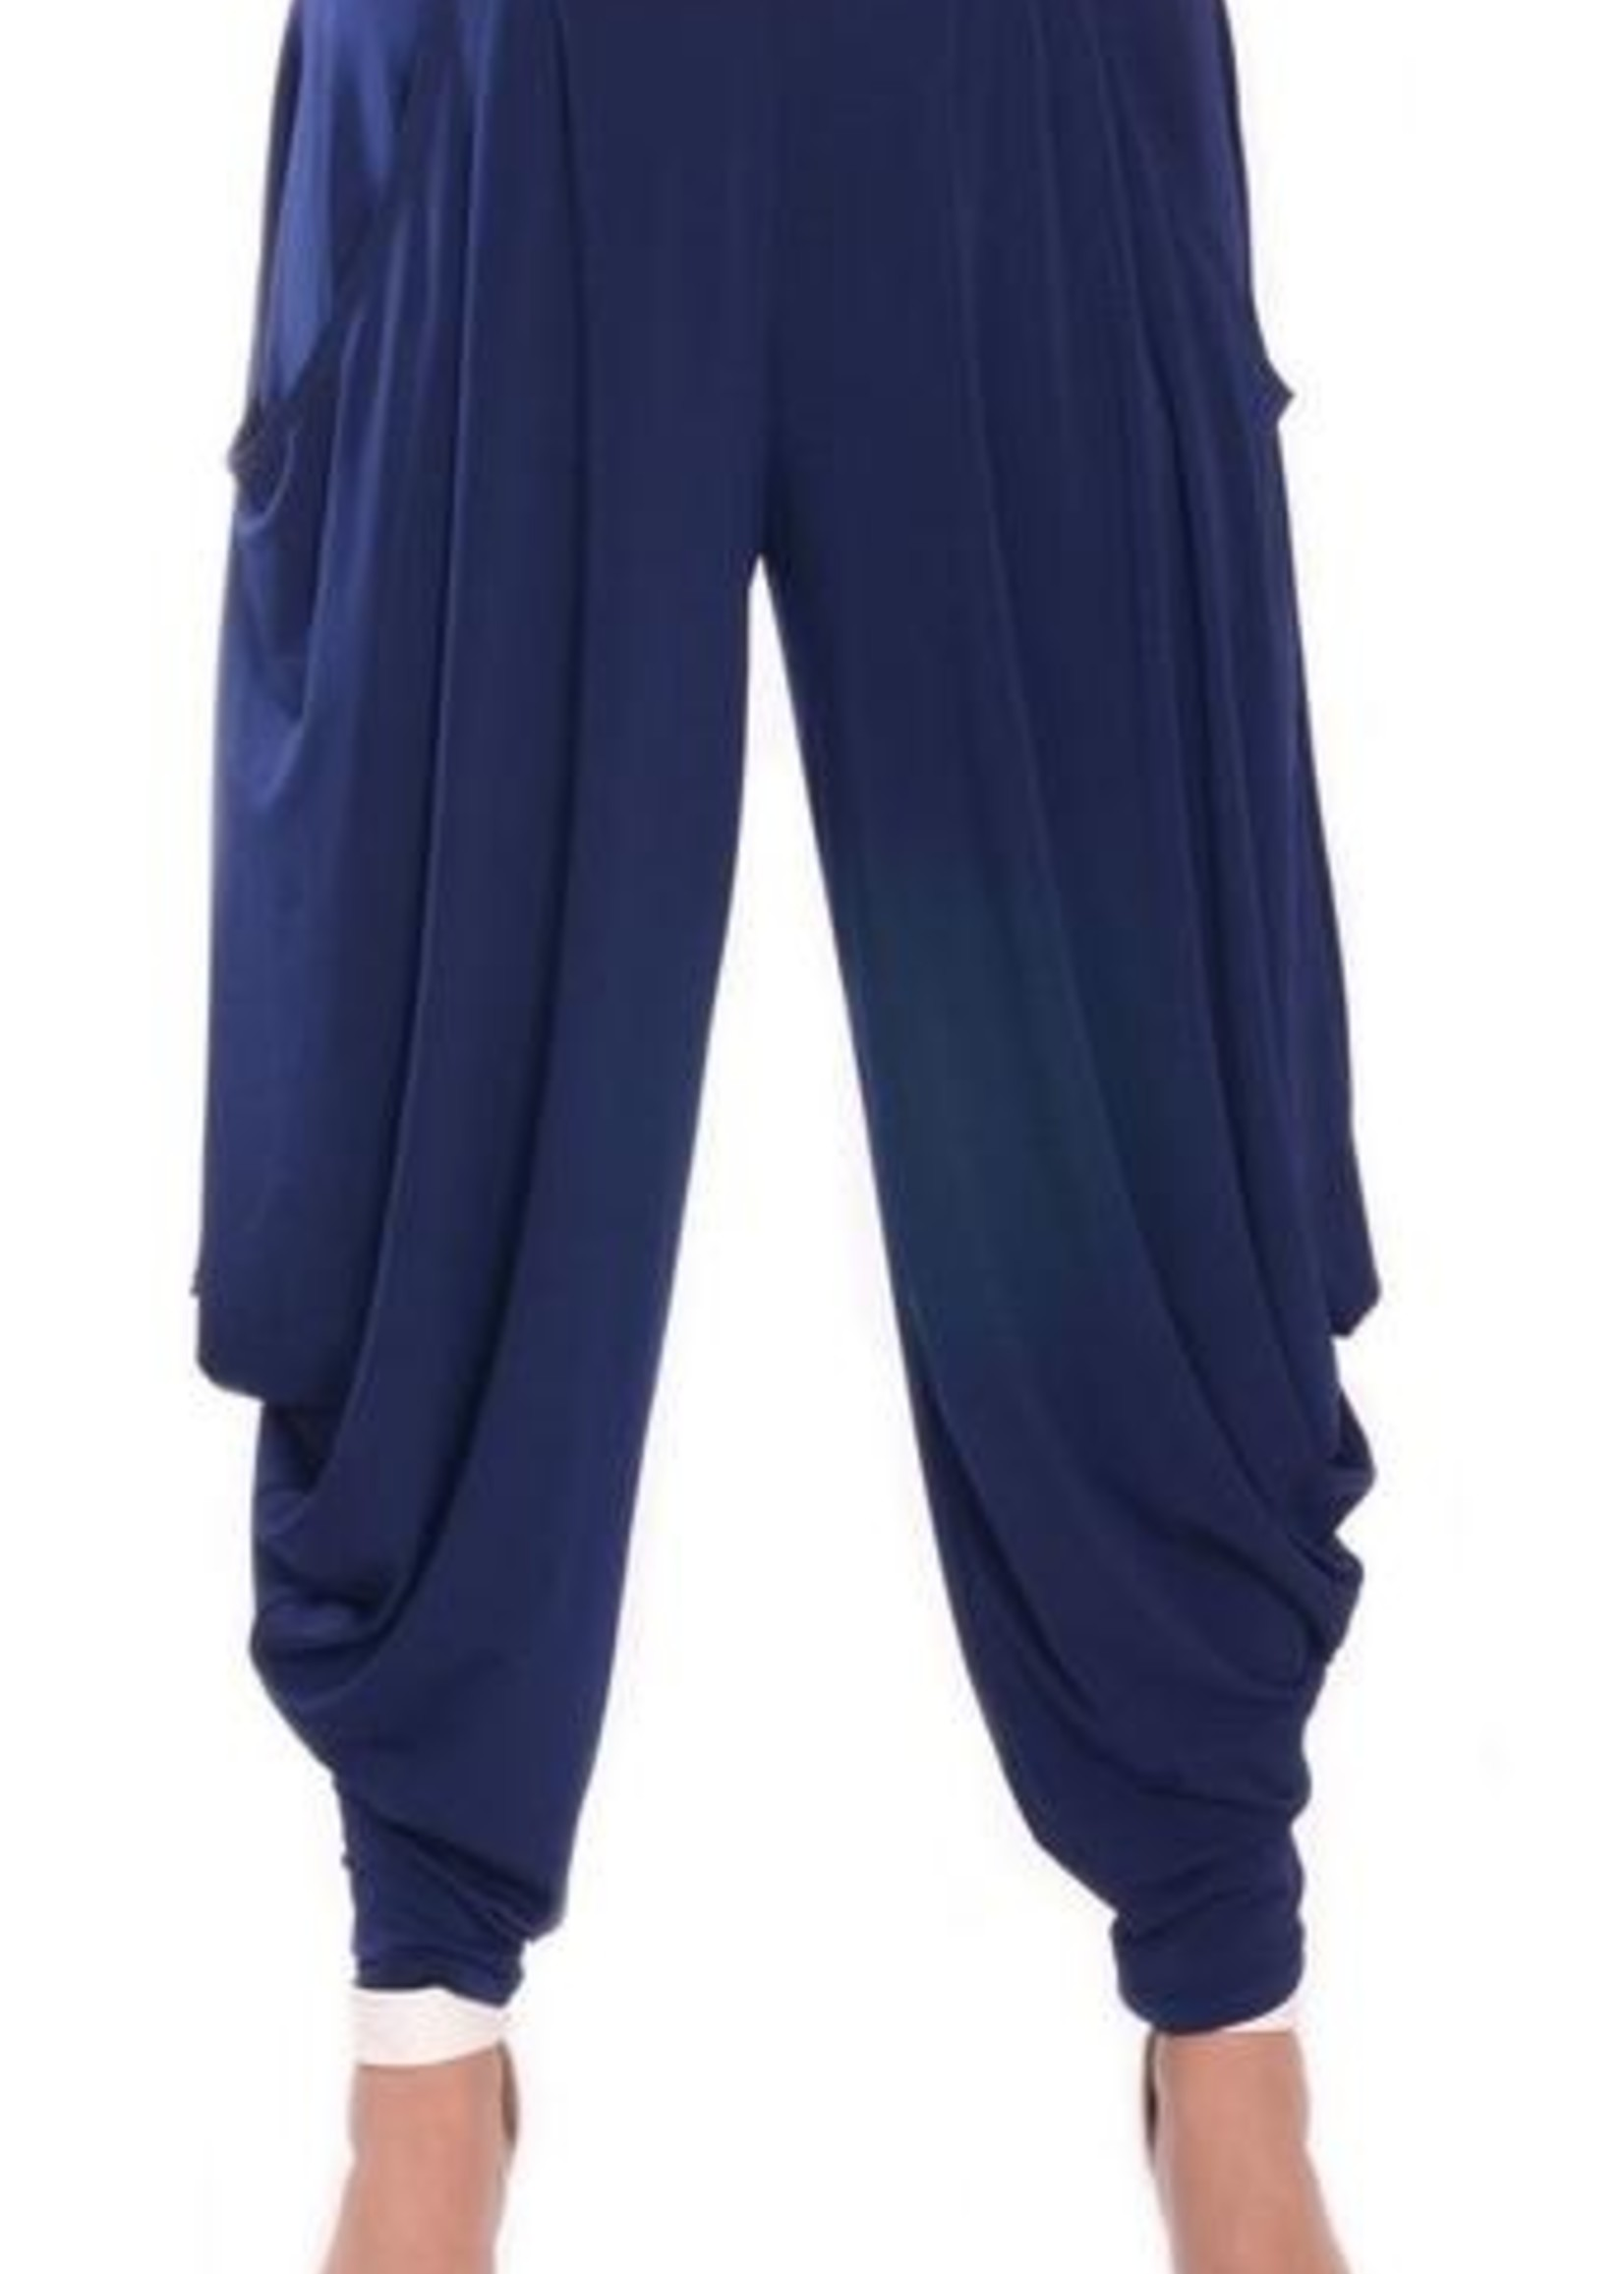 Fashque Drop Pocket Pants Navy Medium